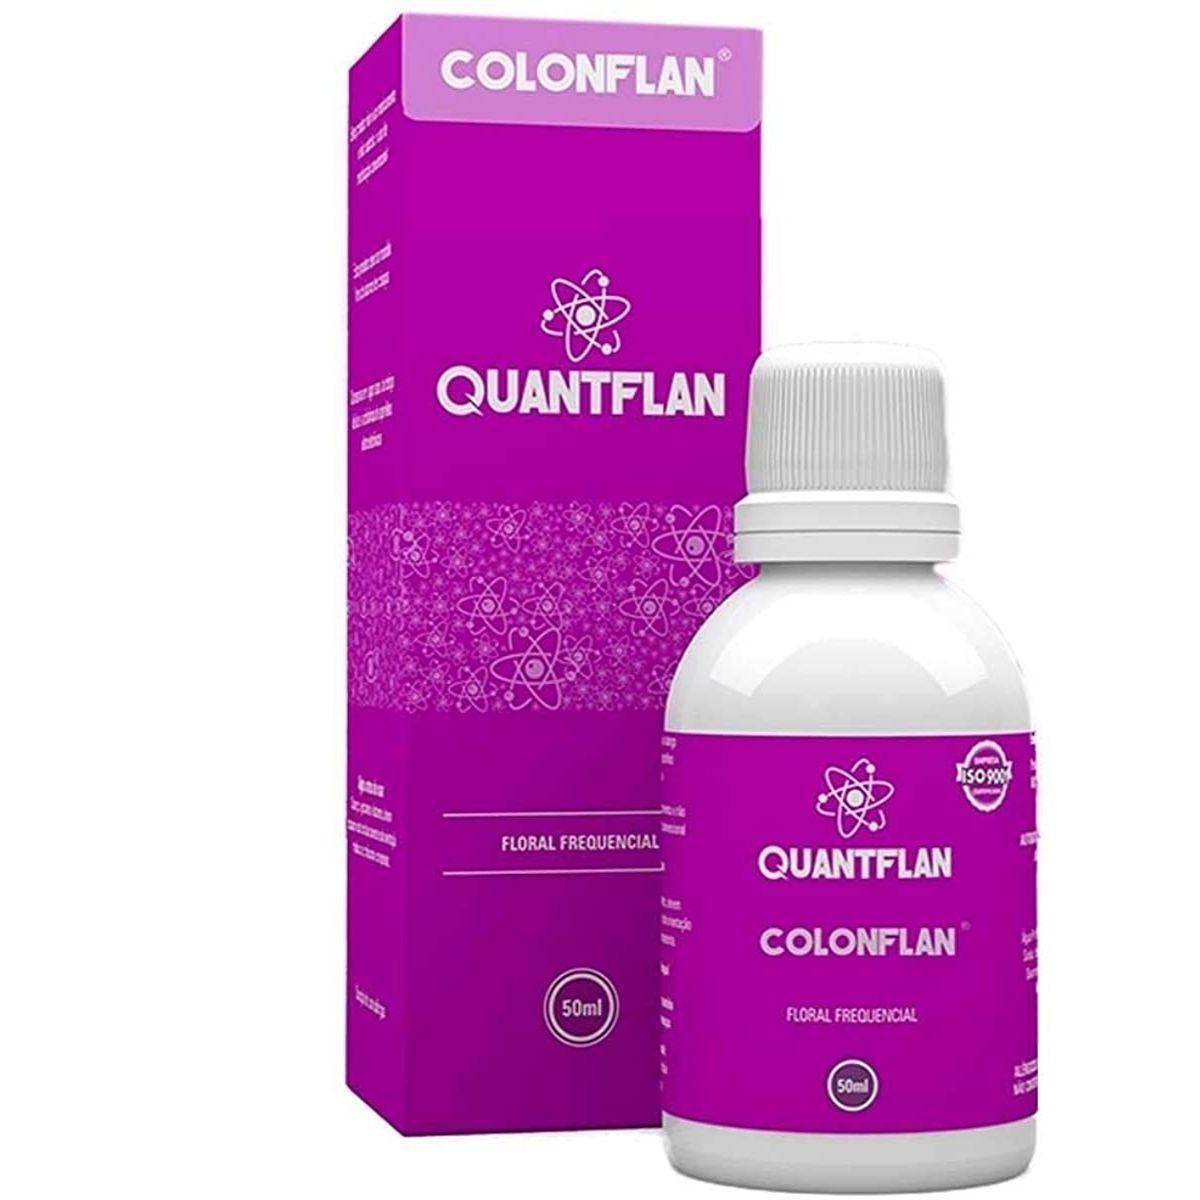 COLONFLAN 50 ML QUANTFLAN